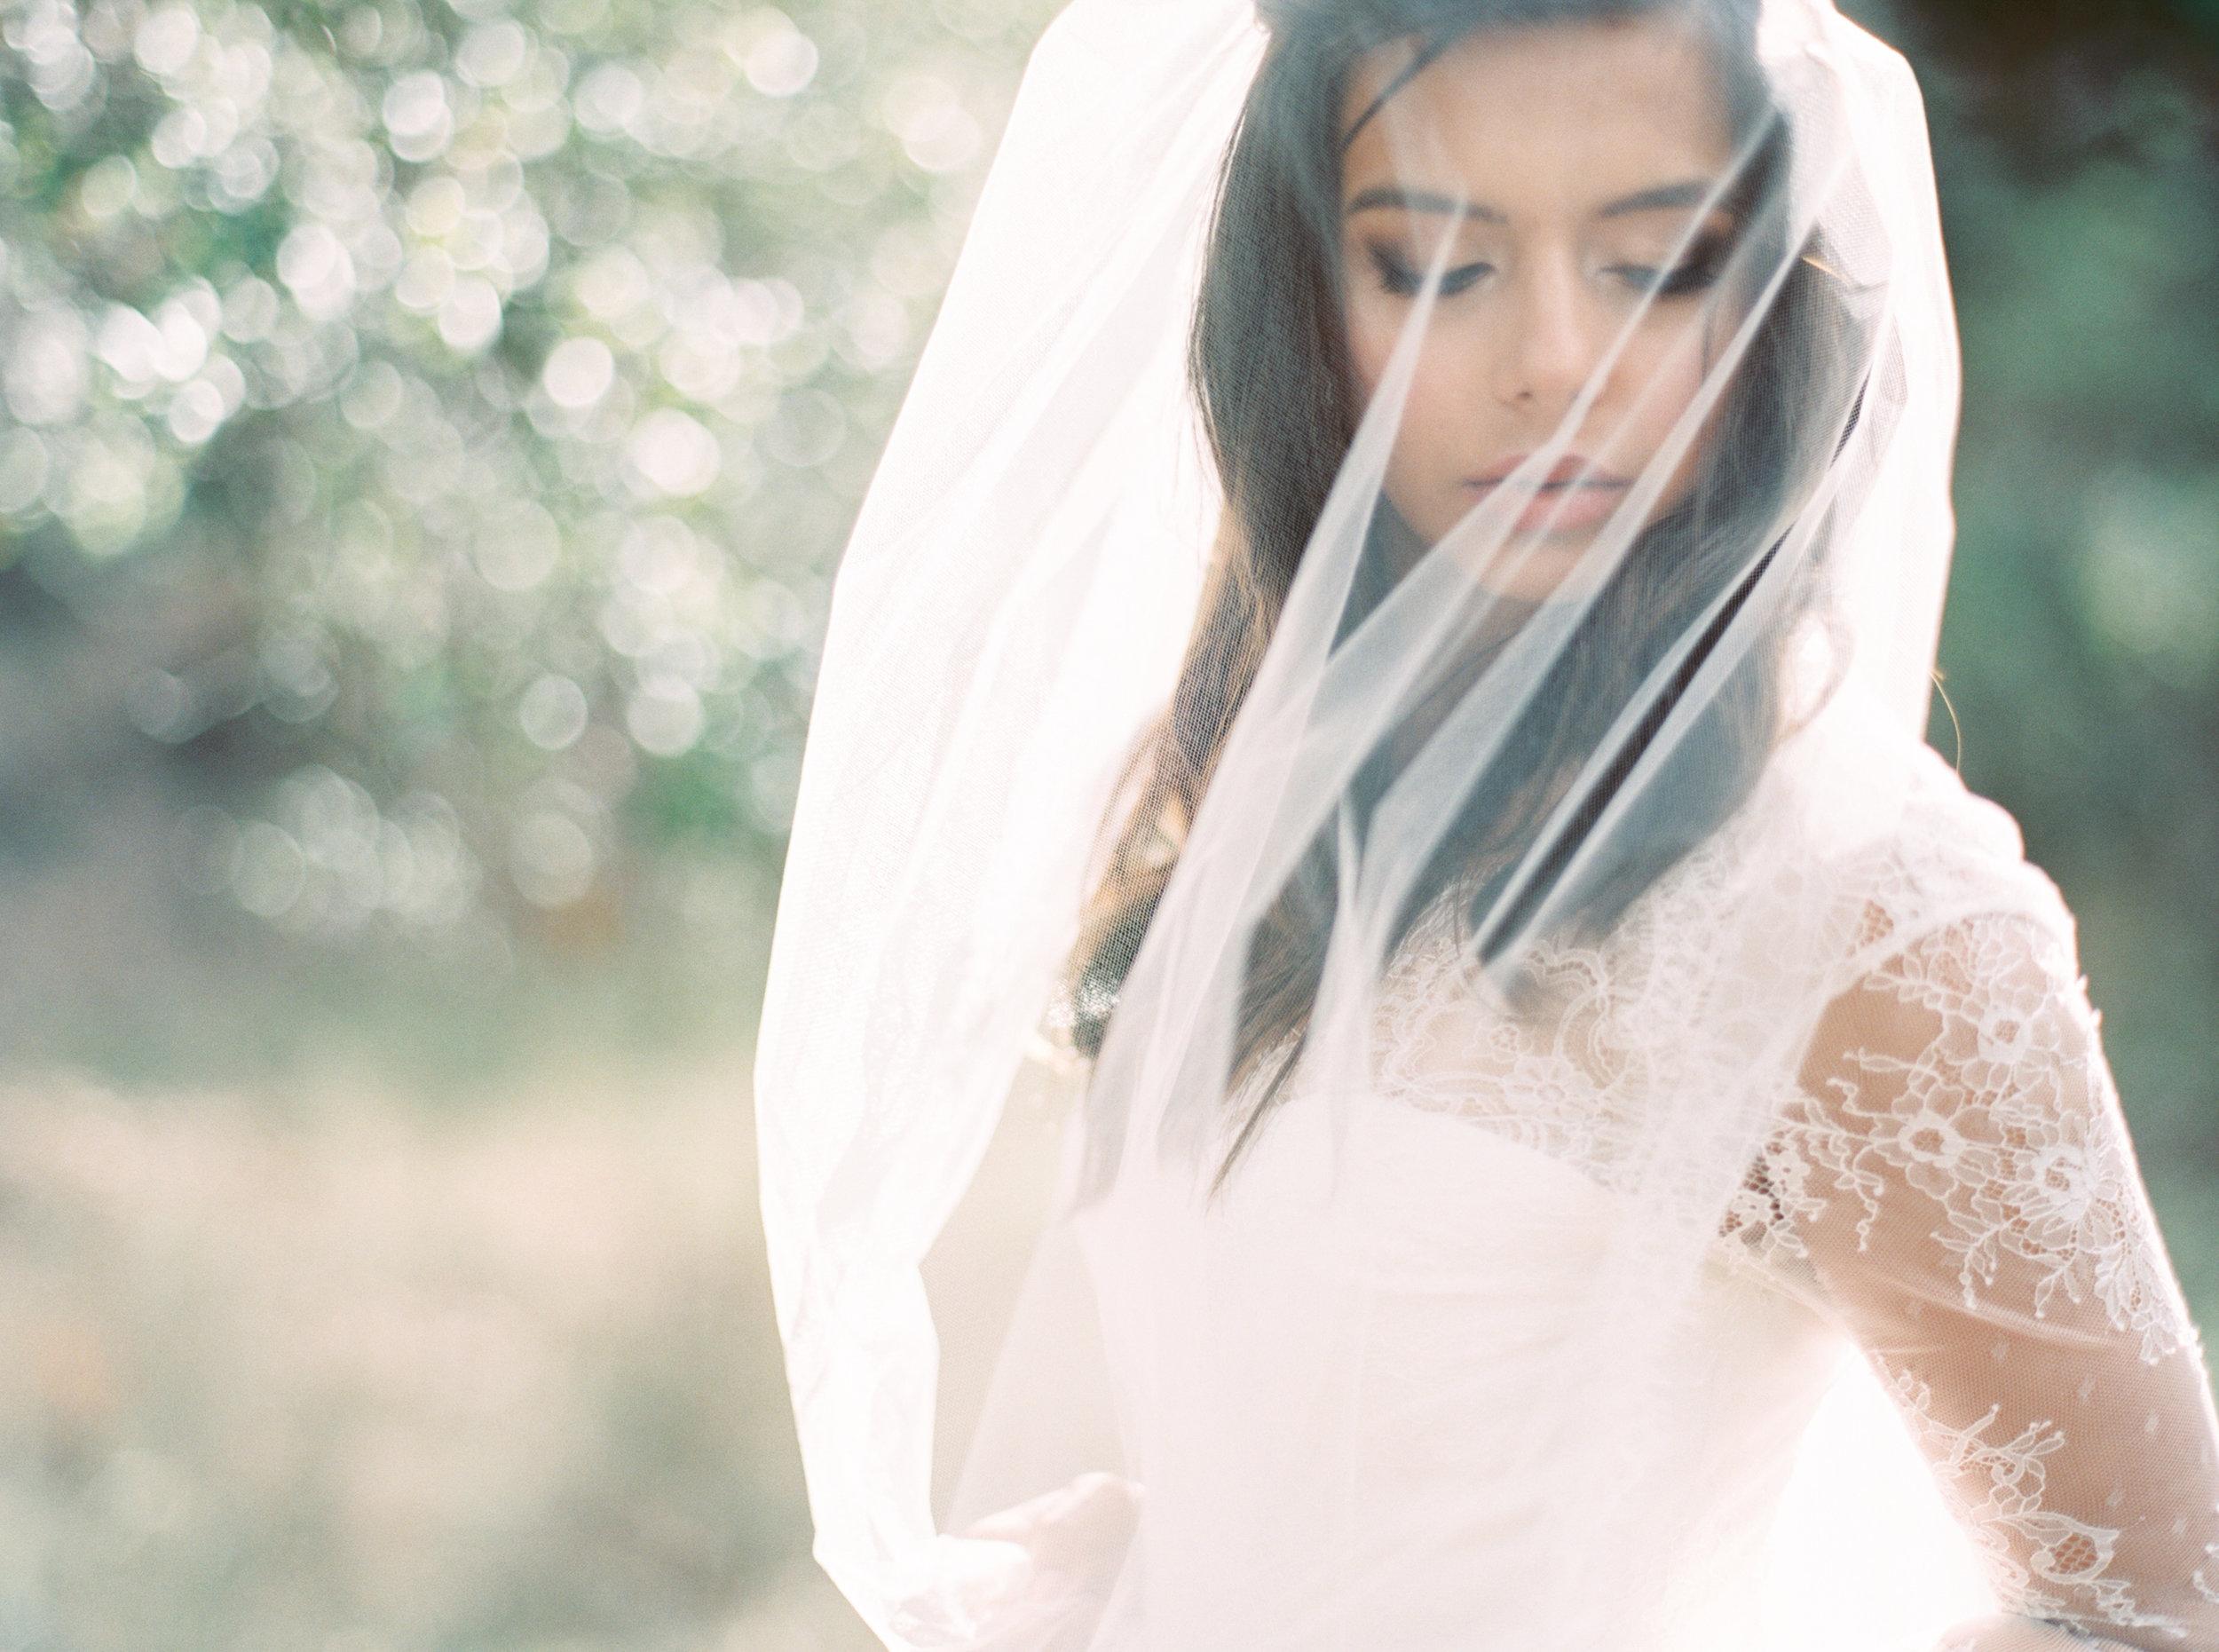 long-sleeve-lace-wedding-dress-4.jpg